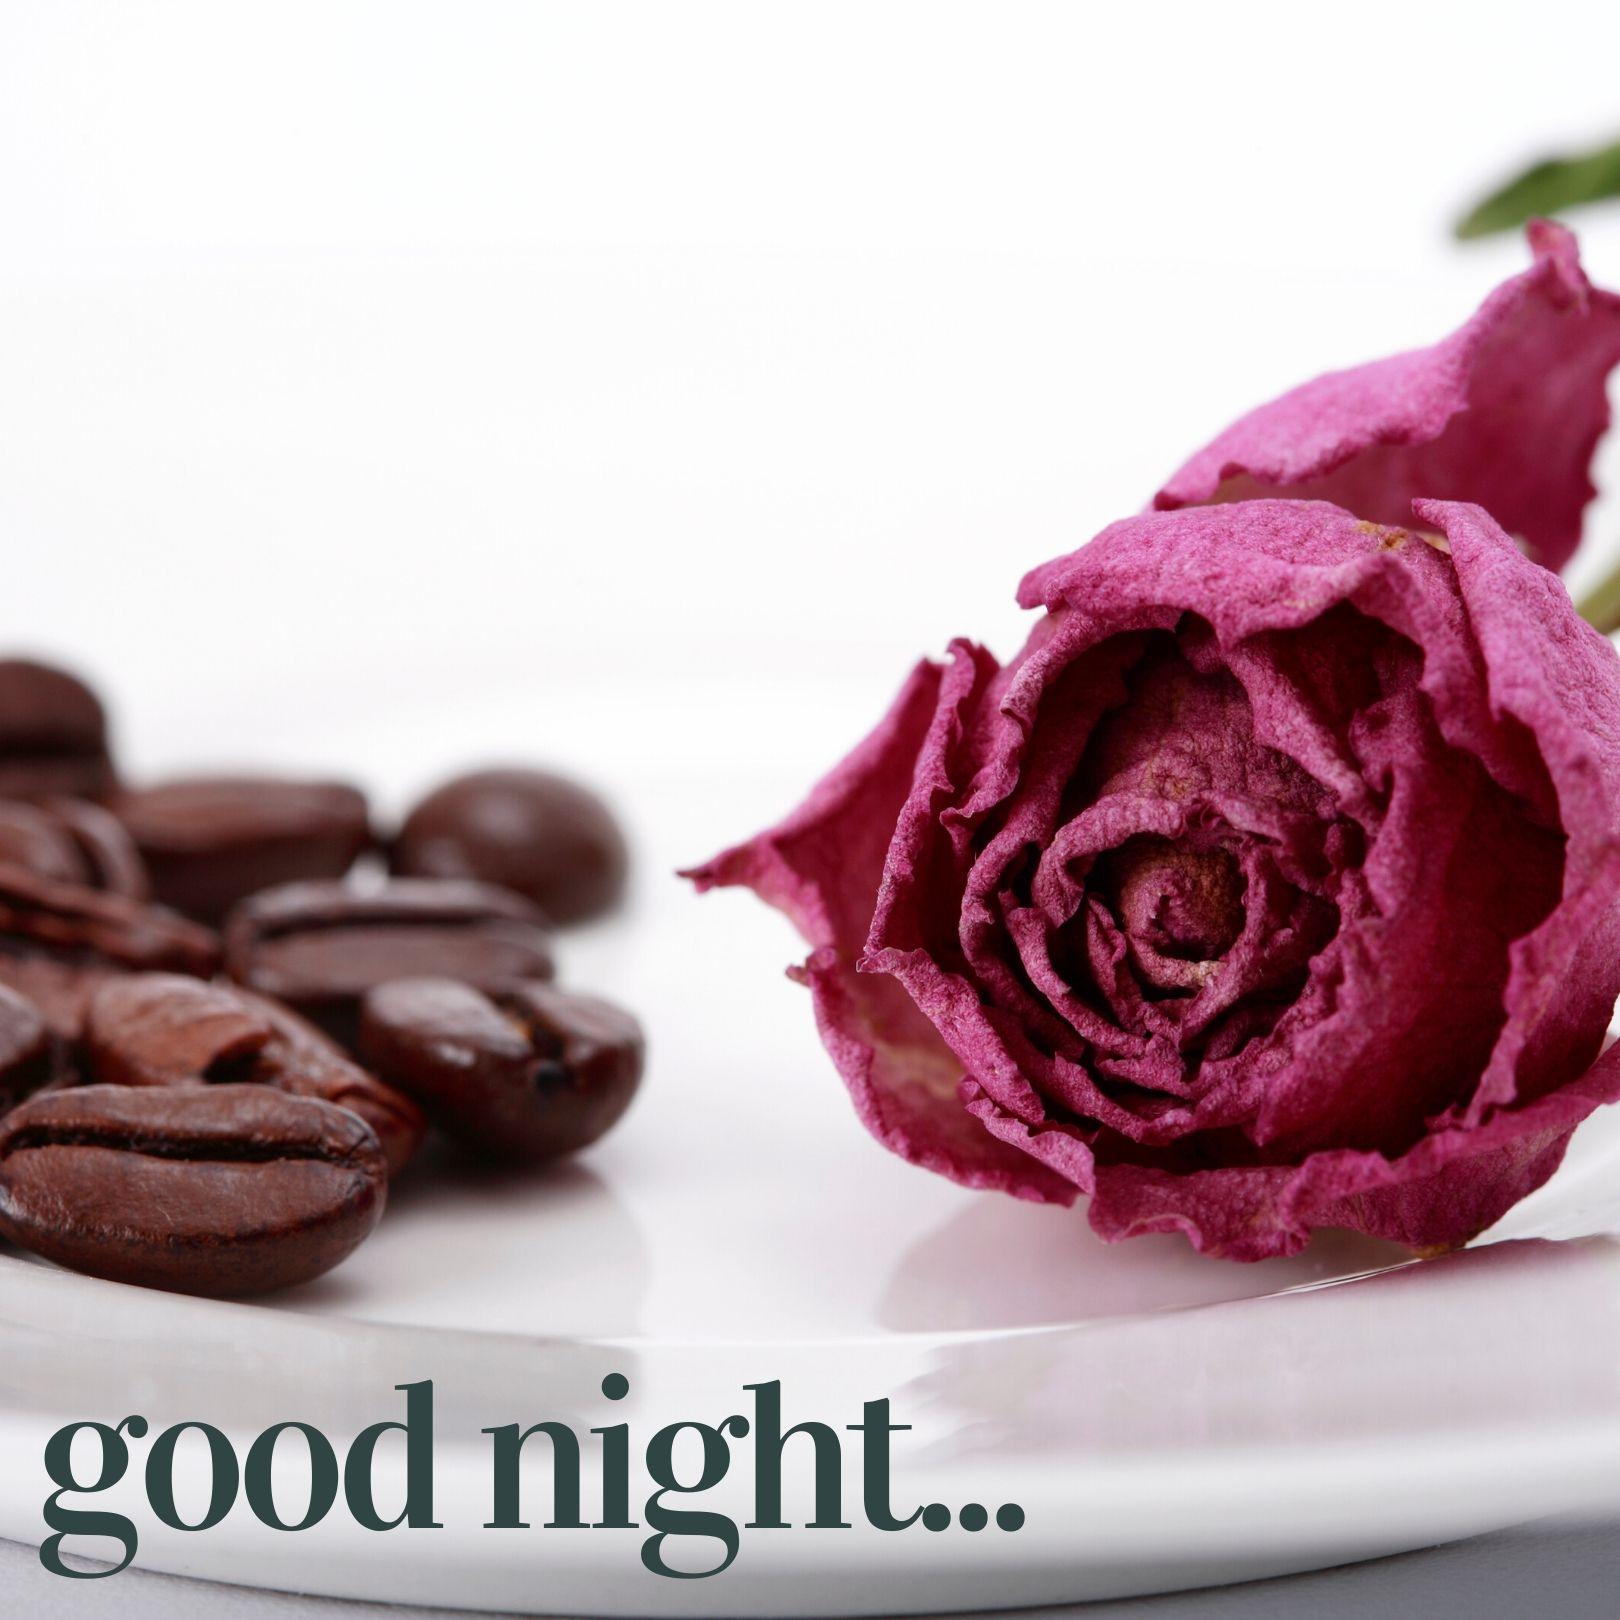 Good Night pic 1 full HD free download.